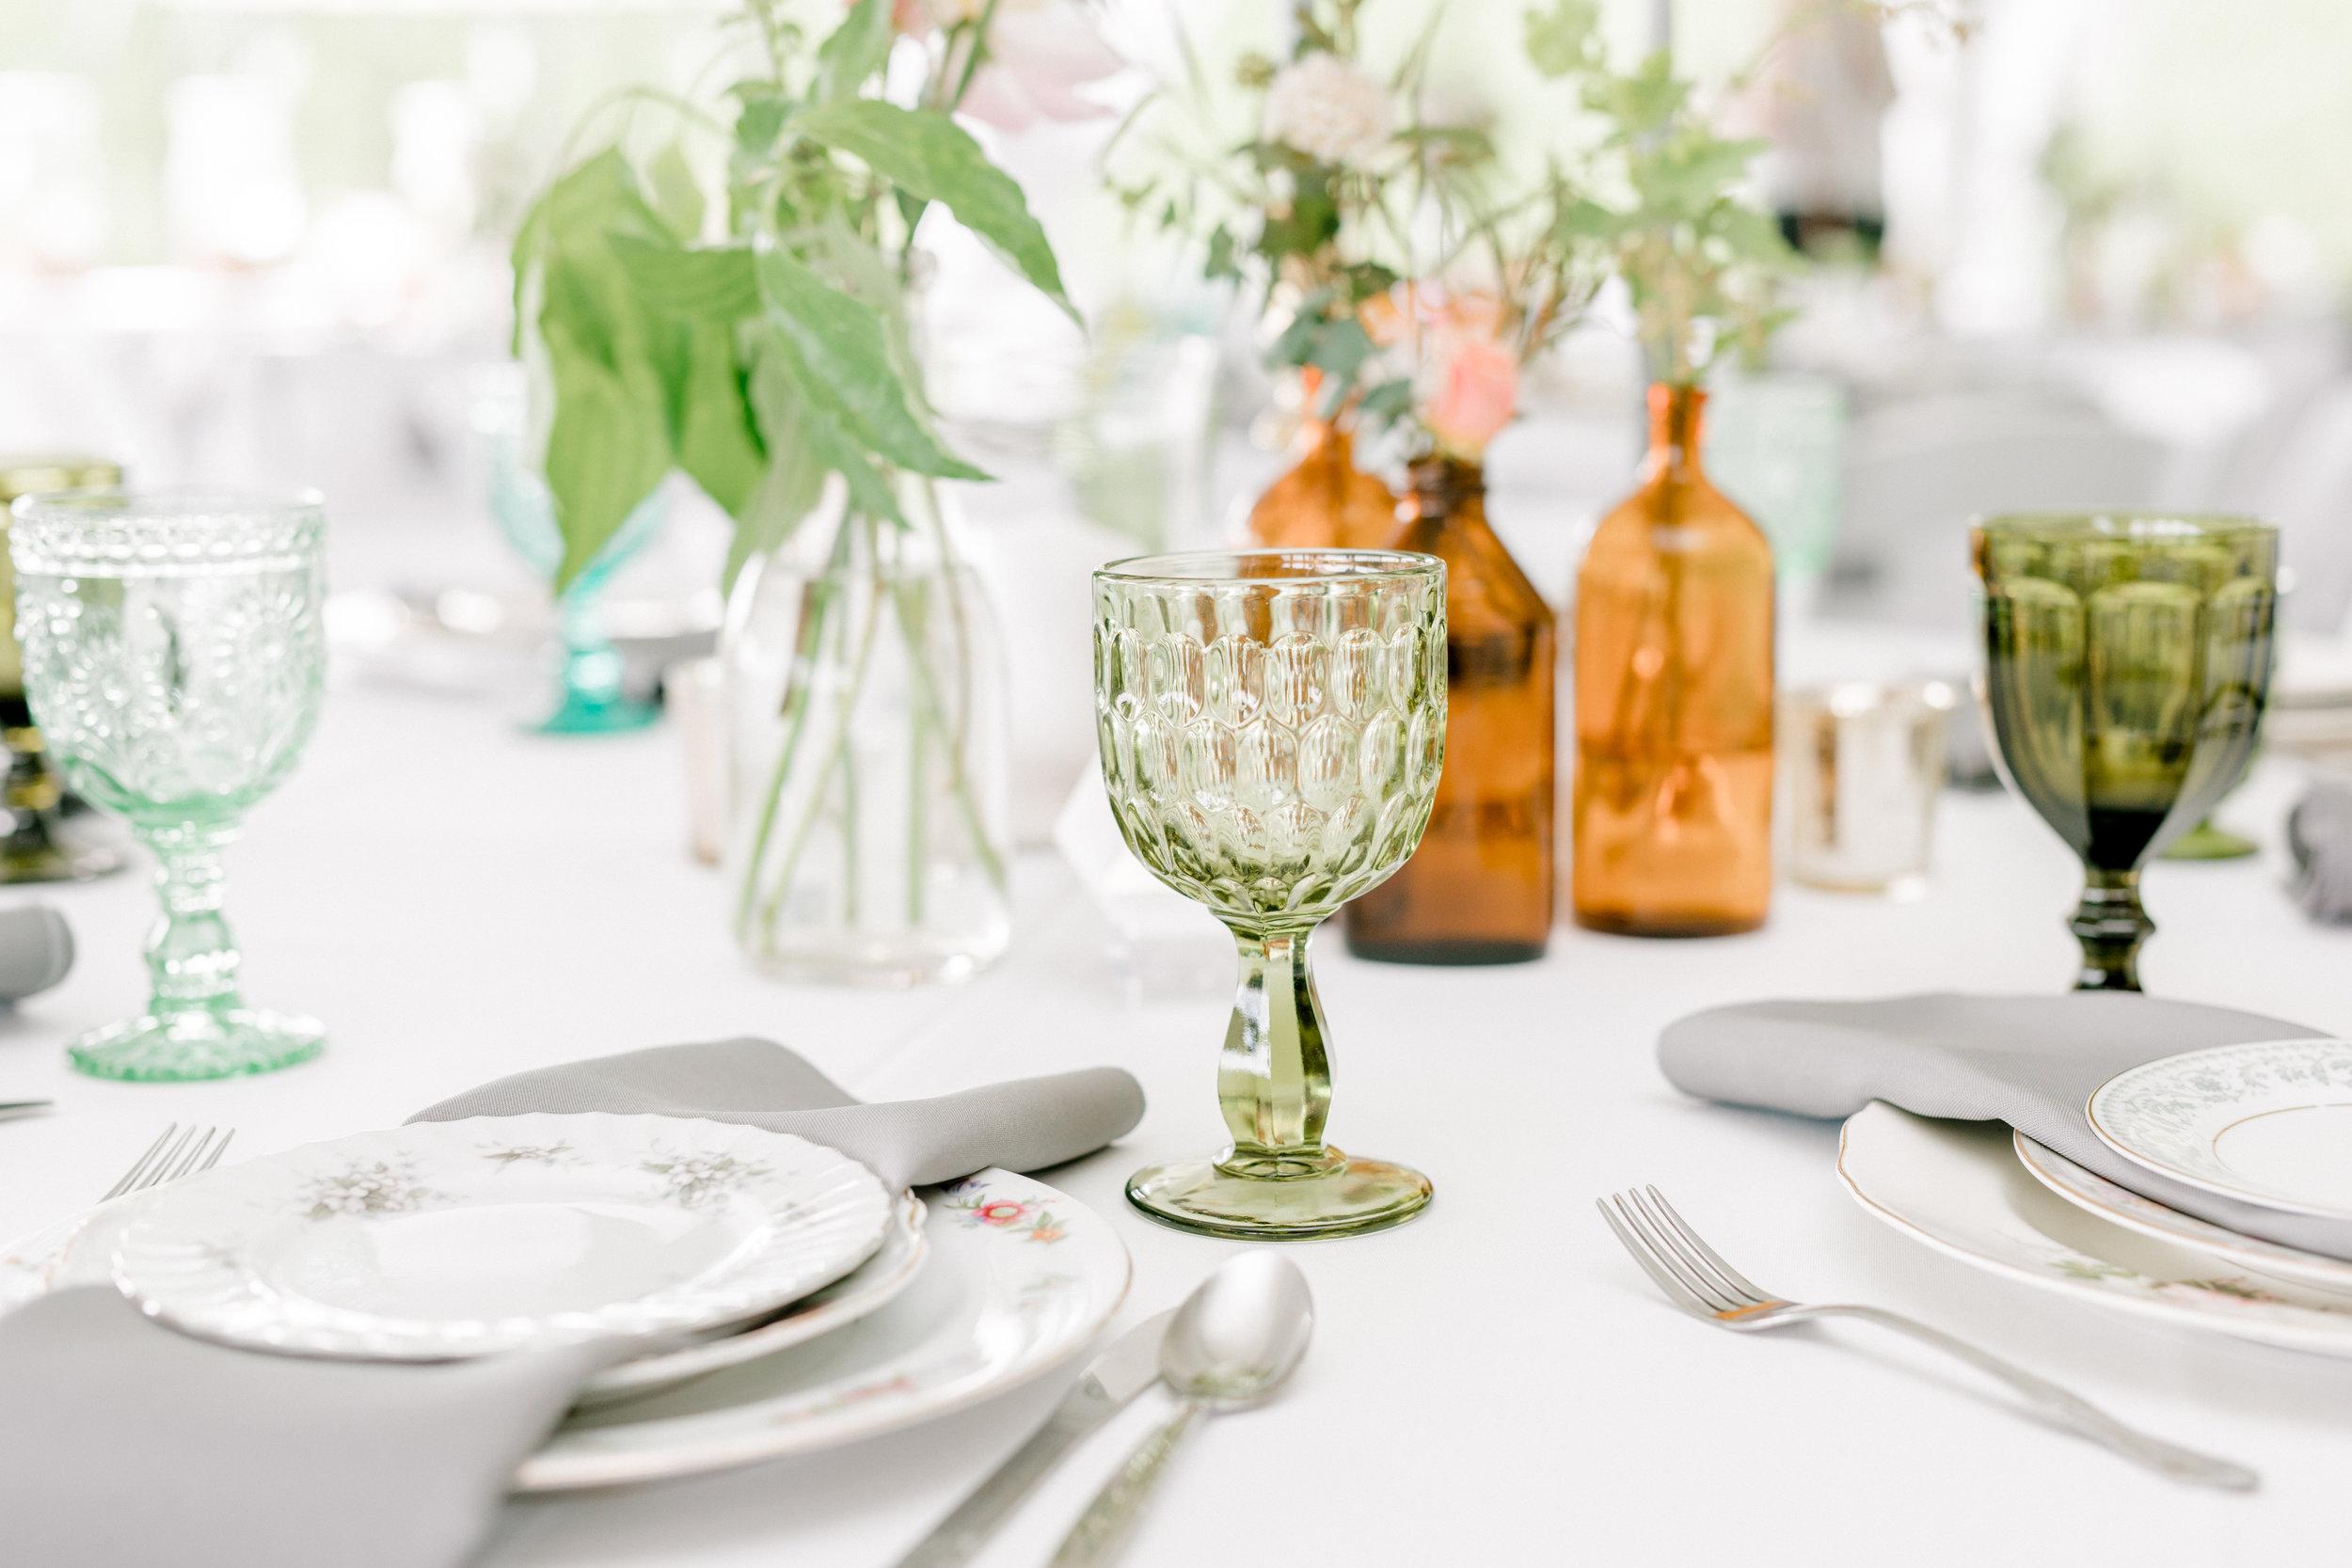 haley-richter-photography-summer-vineyard-winery-wedding-ecclectic-green-glass-goblet-glass-bottle-centerpiece-vintage-plates-gray-napkins